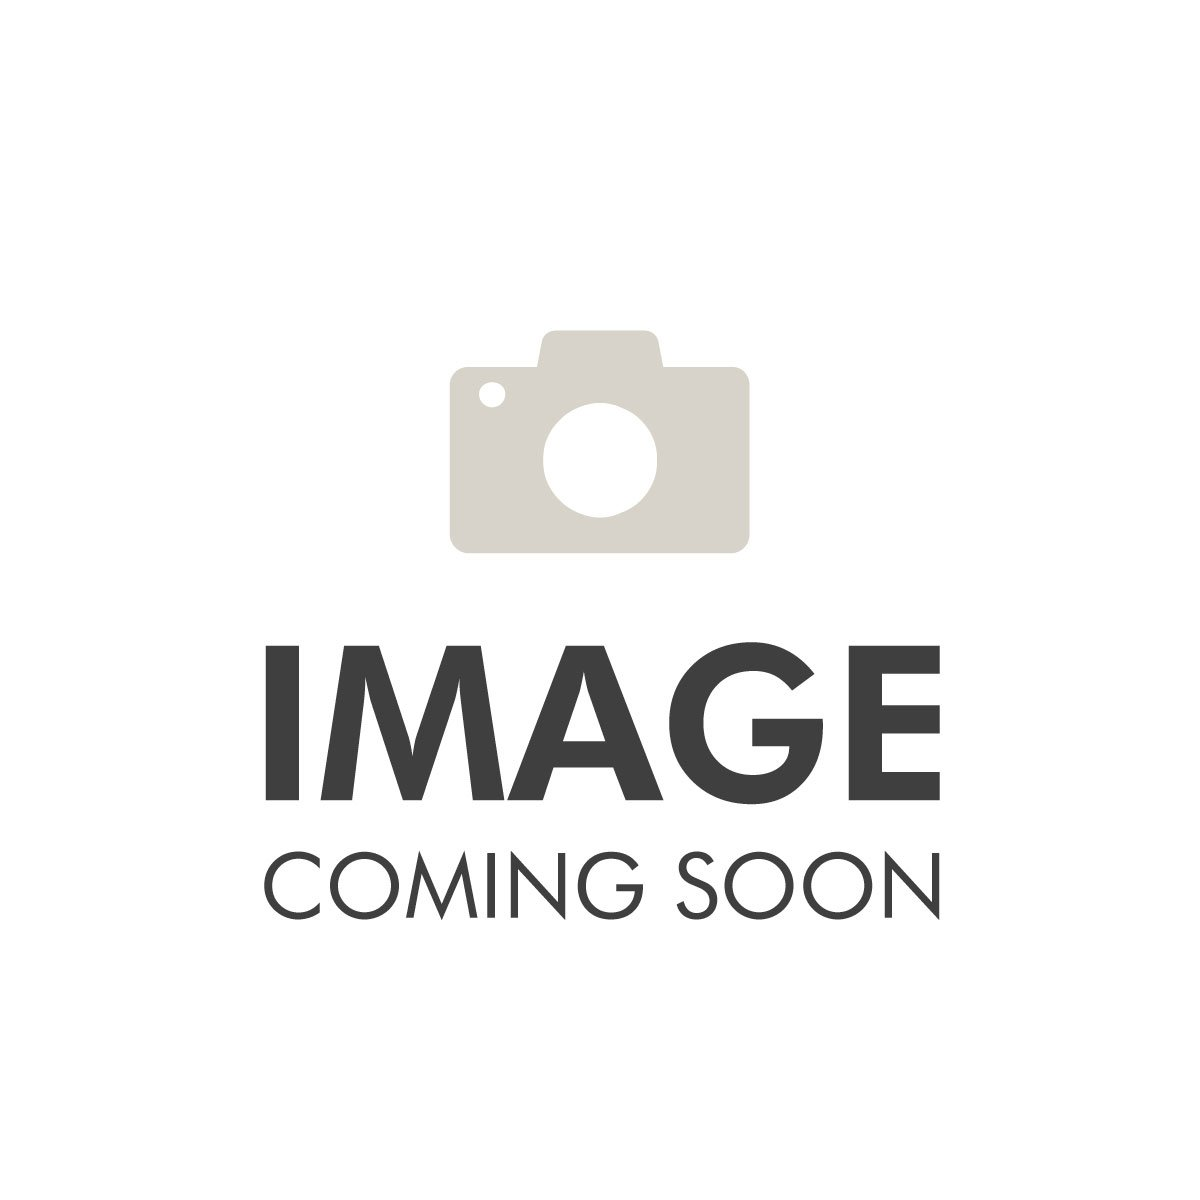 Absolute - Veste de fleuret Signature - Inox - Homme